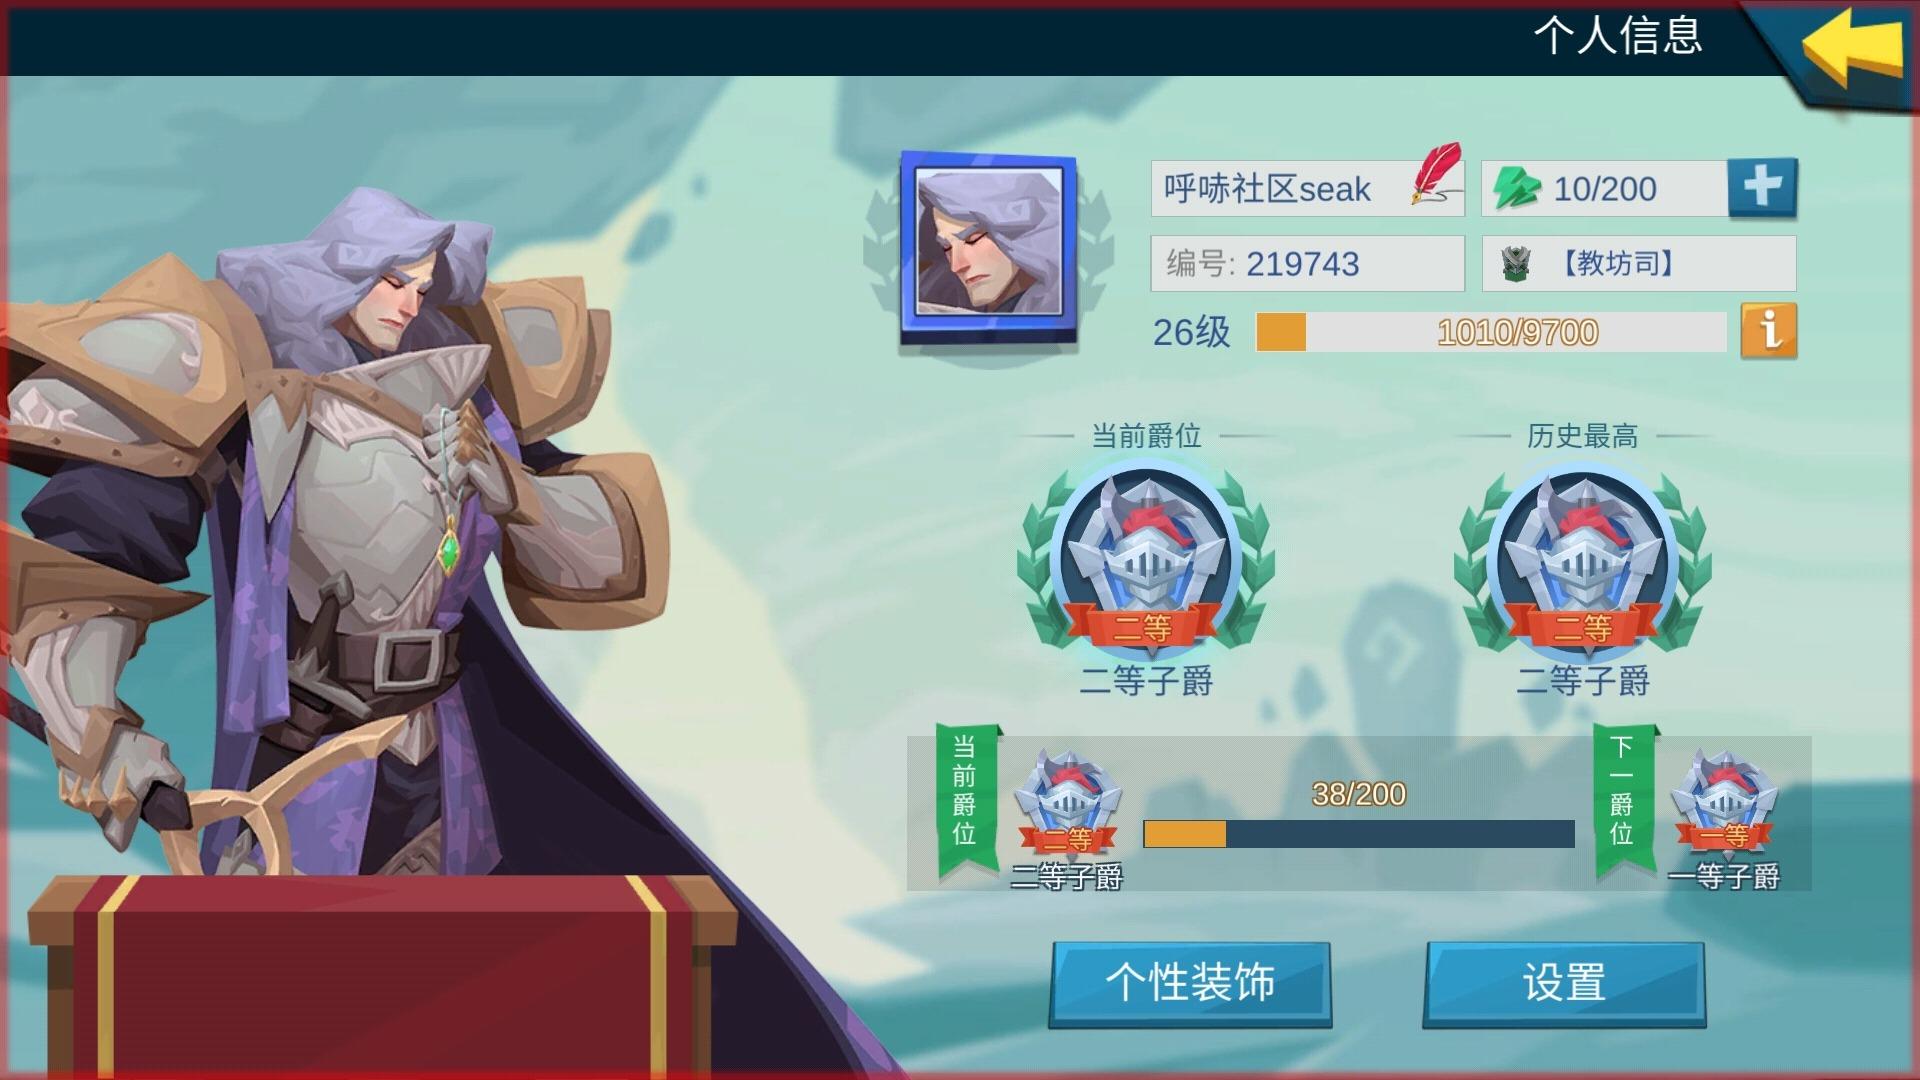 Screenshot_2021-06-02-11-22-09-377_com.jedigames.p21.guanwang.jpg